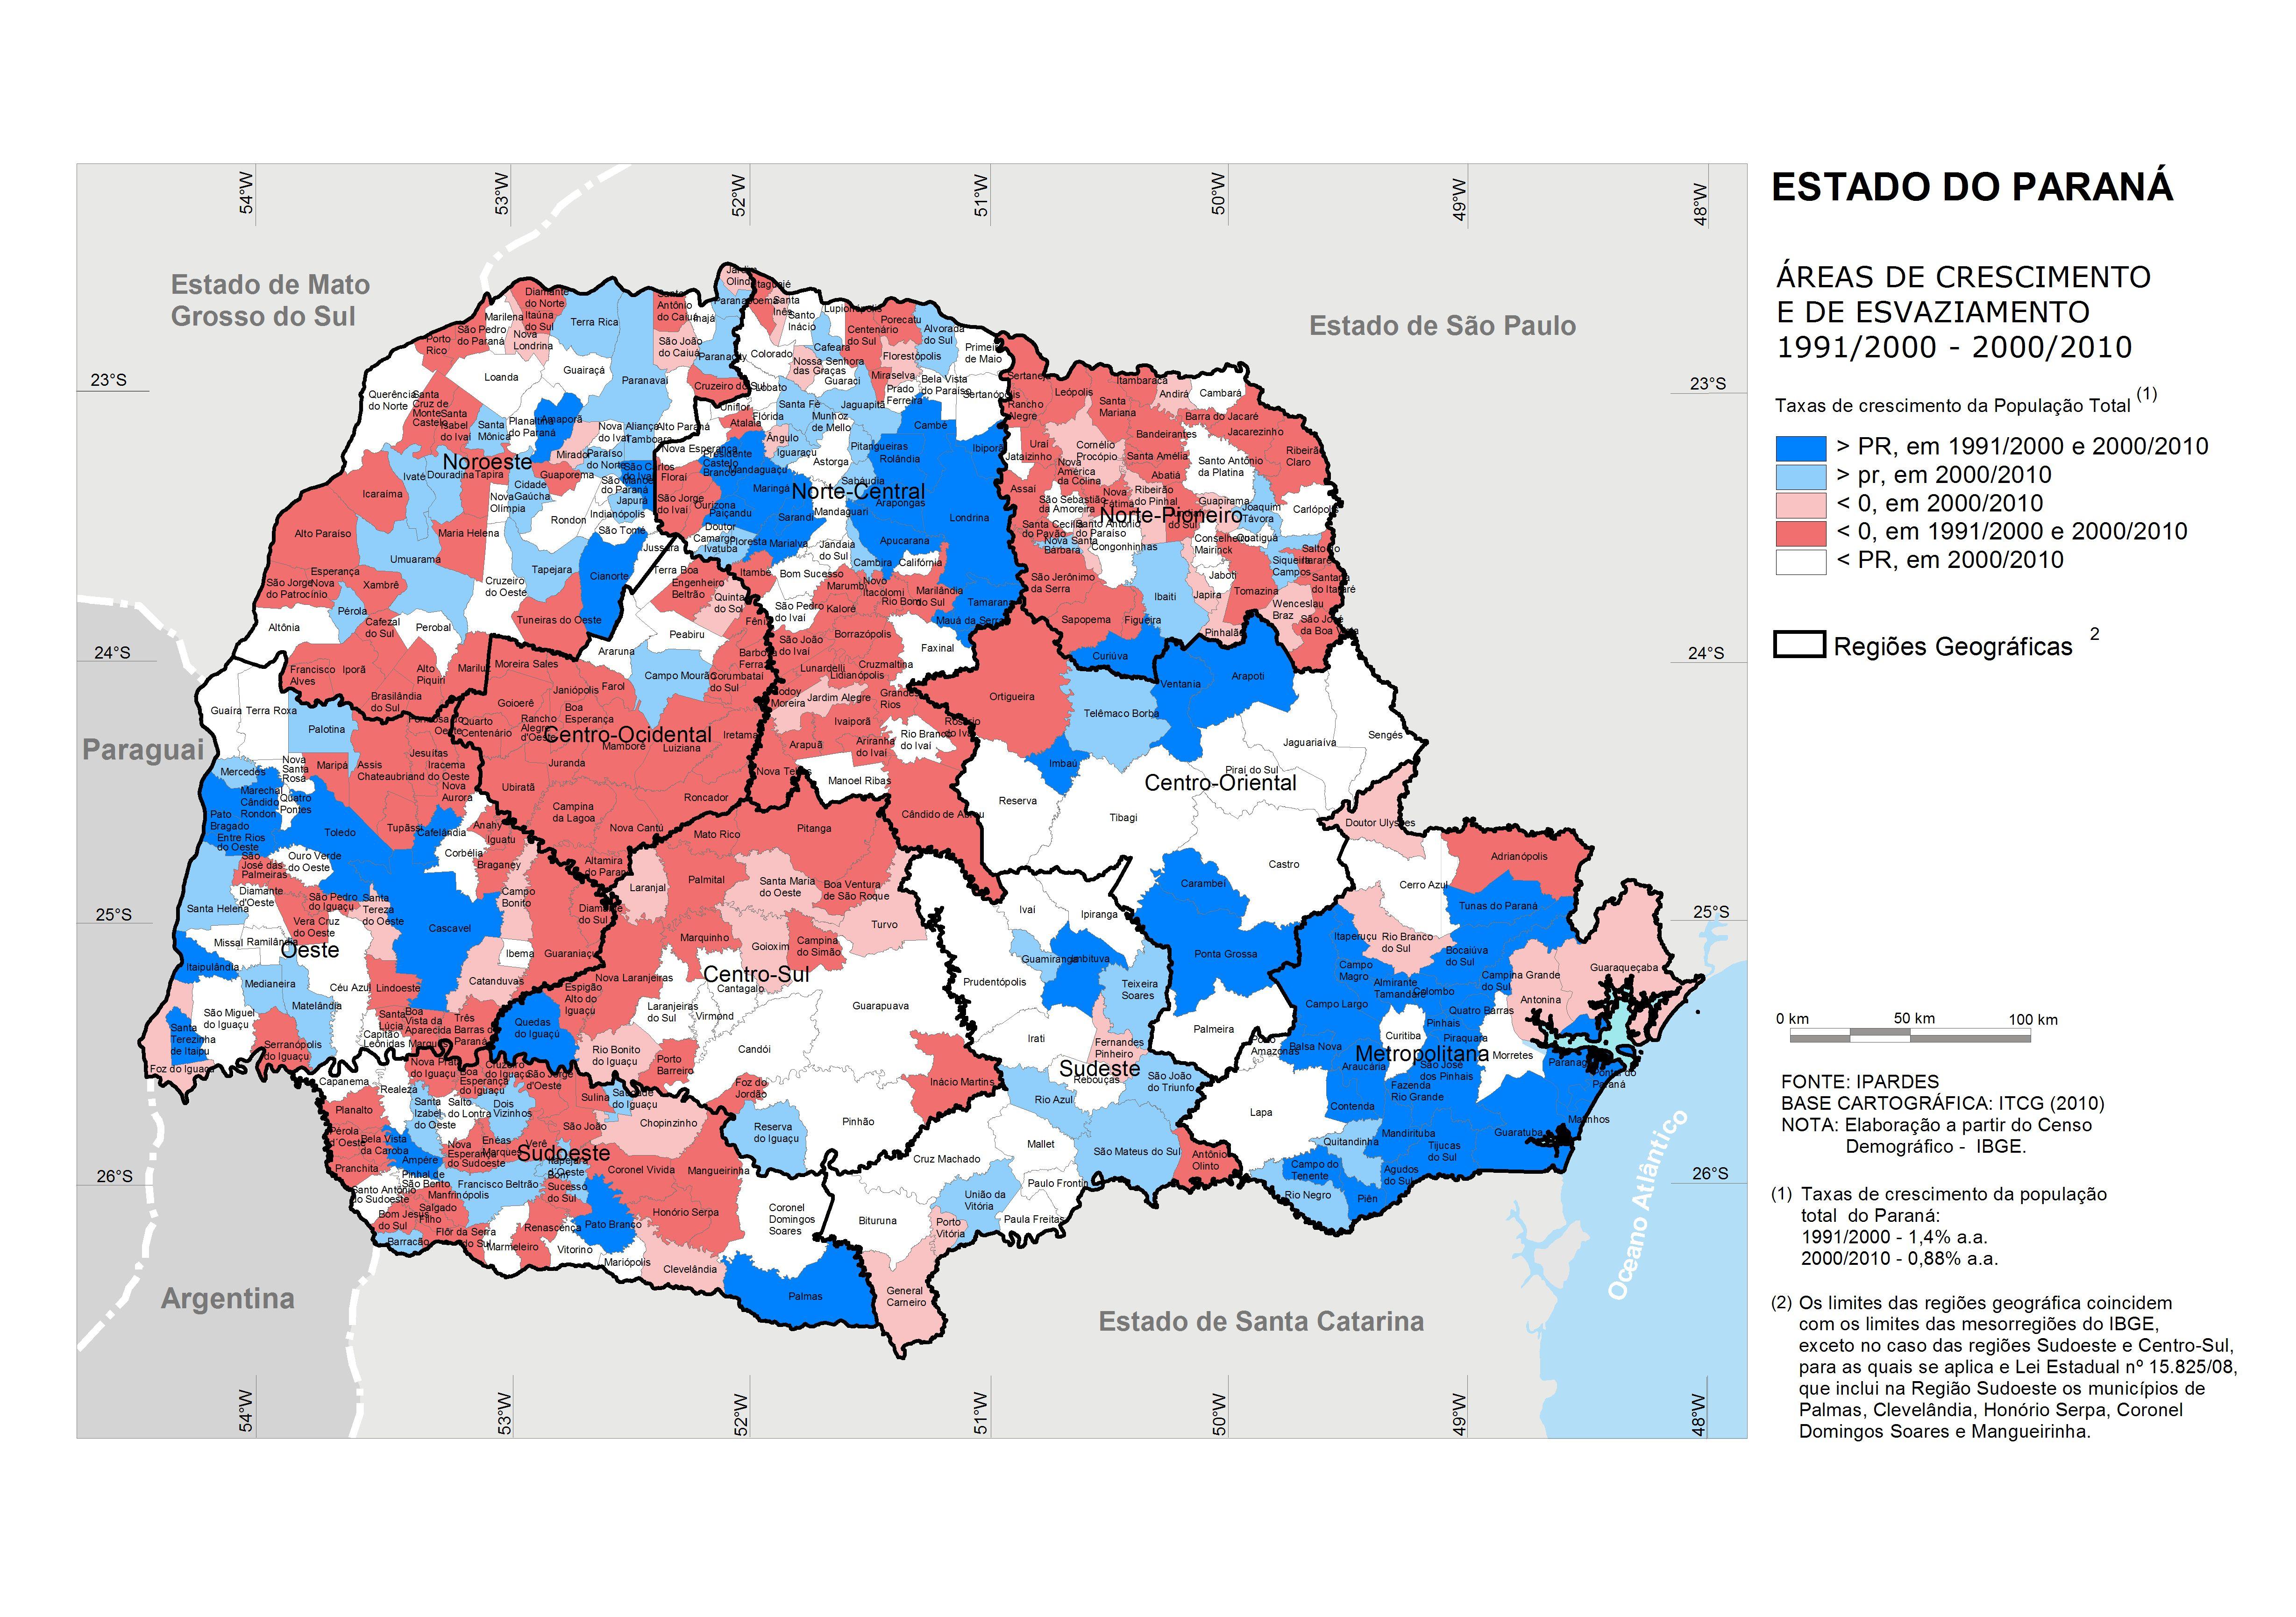 Dilogos interdisciplinares em desenvolvimento territorial dilogos interdisciplinares em desenvolvimento territorial sustentvel polticas ecologias e saberes fandeluxe Images